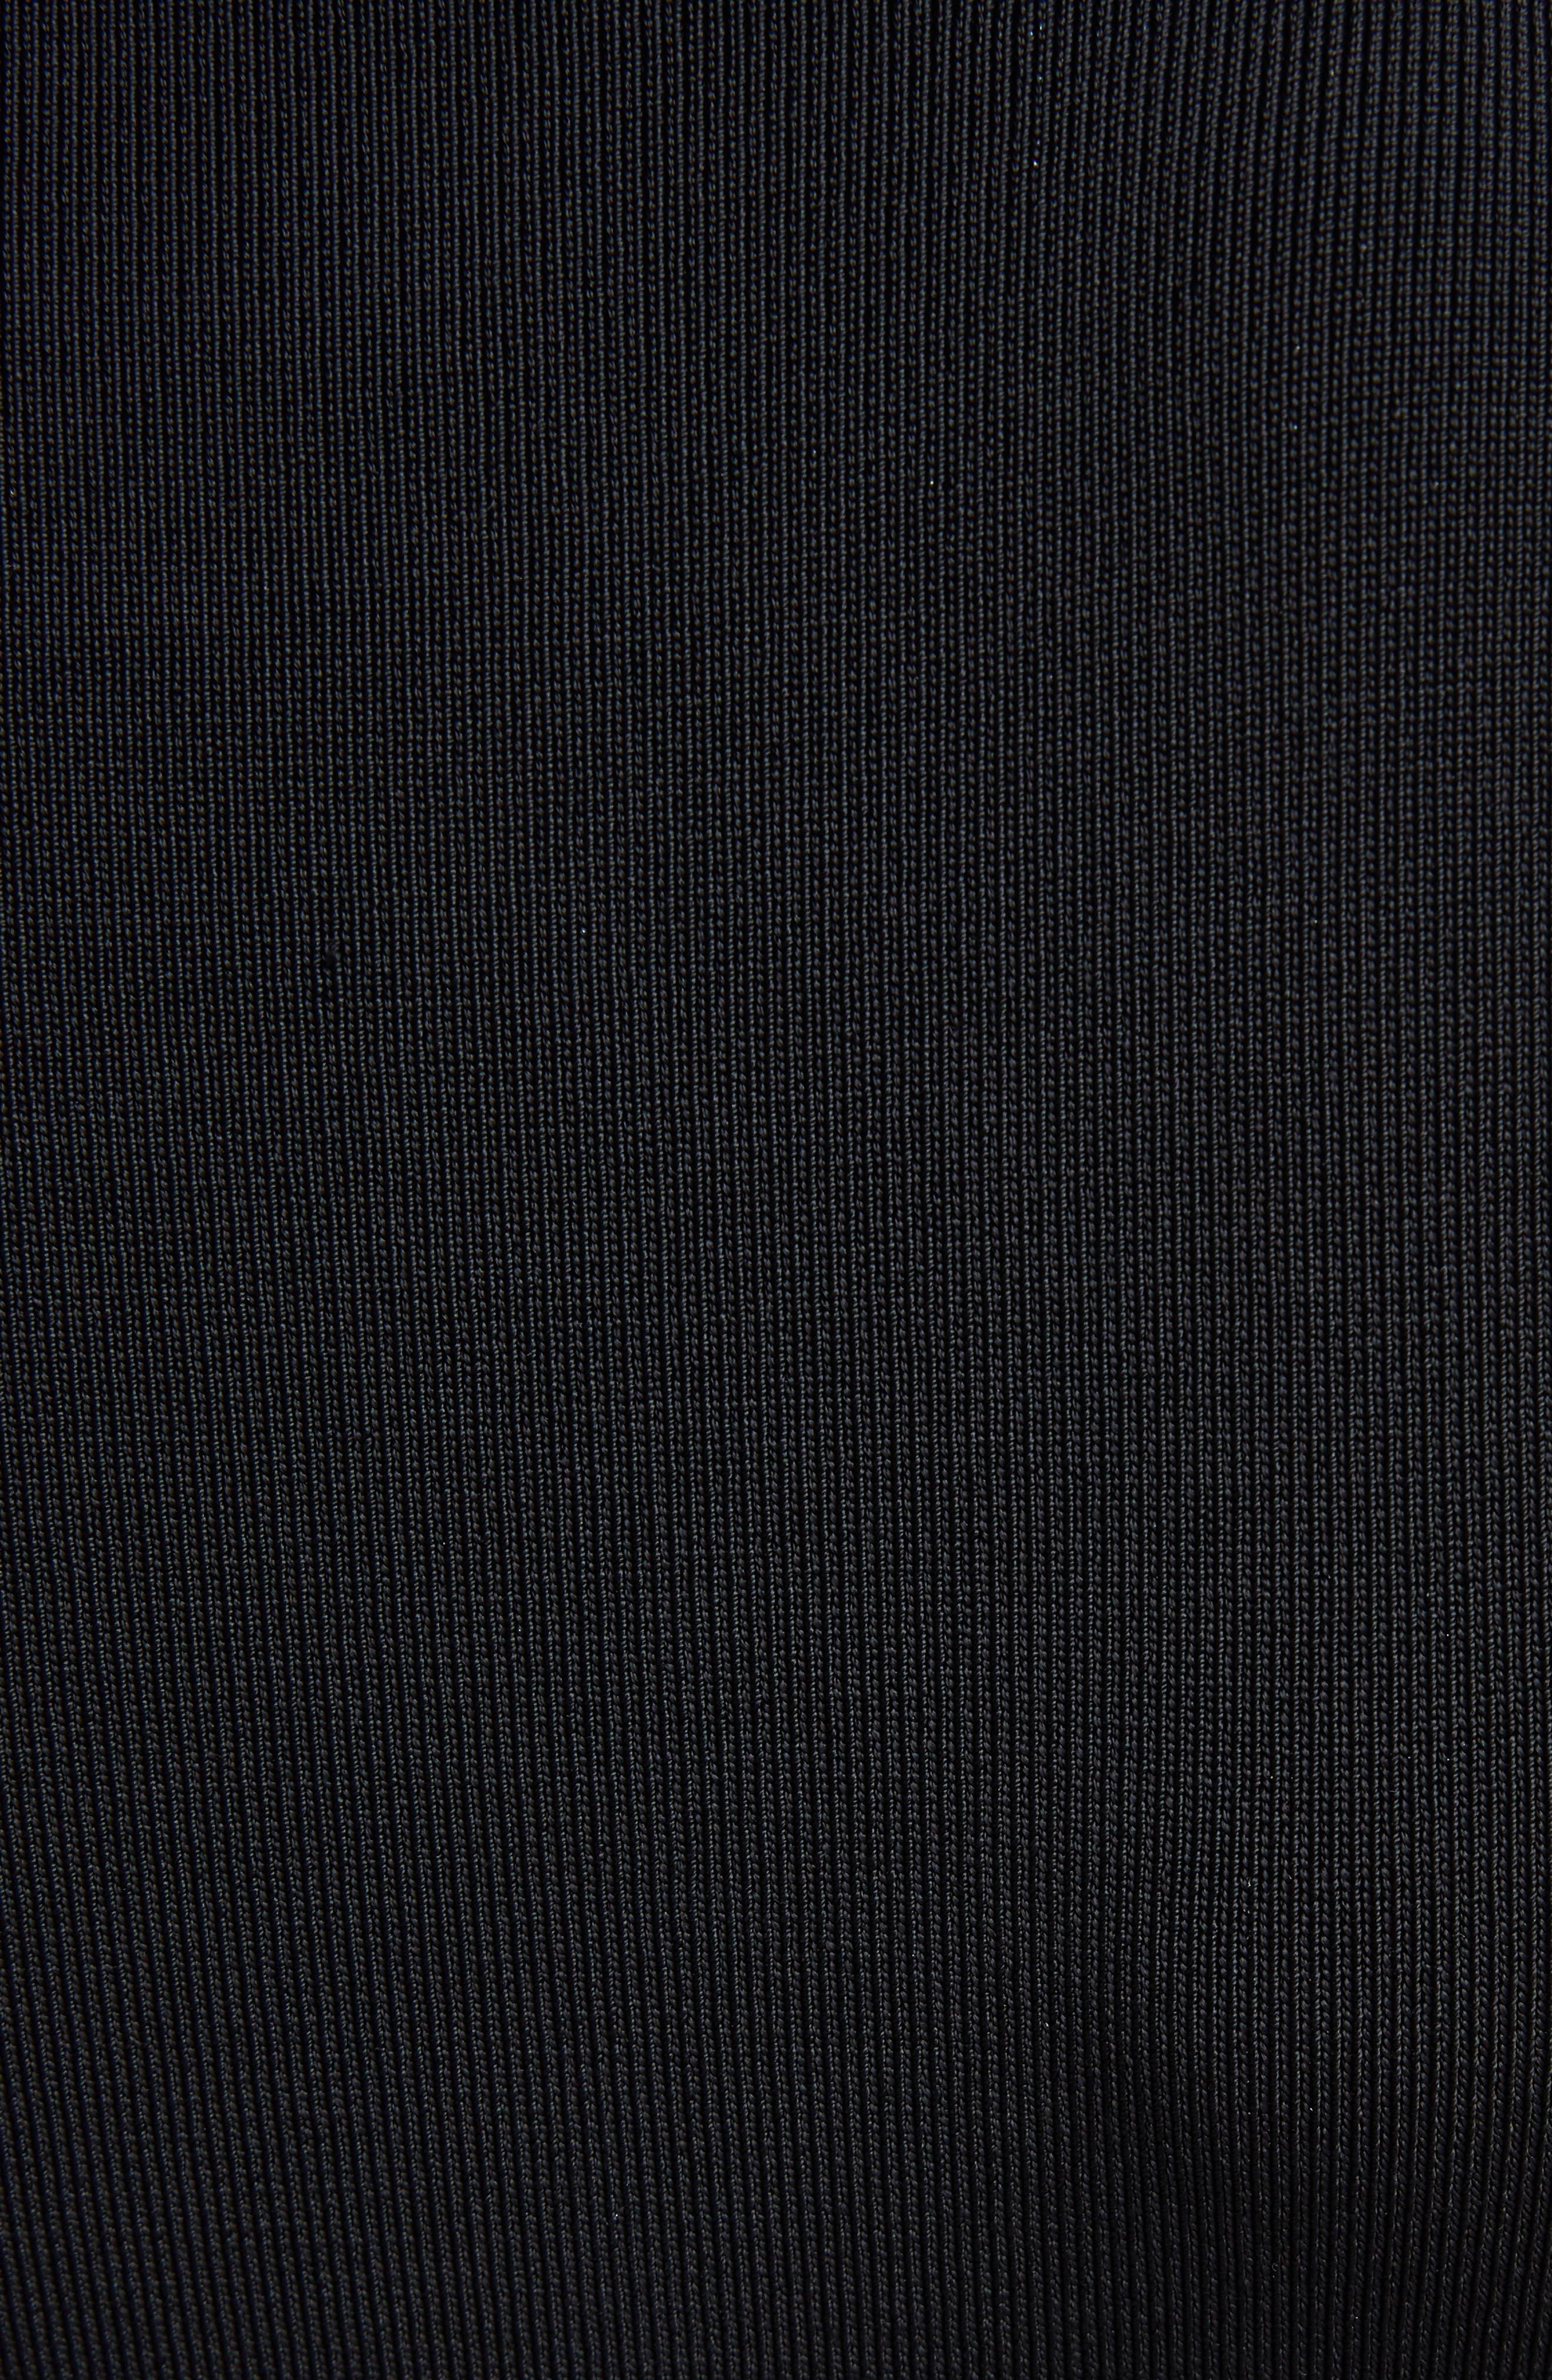 VICTORIA BECKHAM, Cutout Knit Dress, Alternate thumbnail 5, color, BLACK